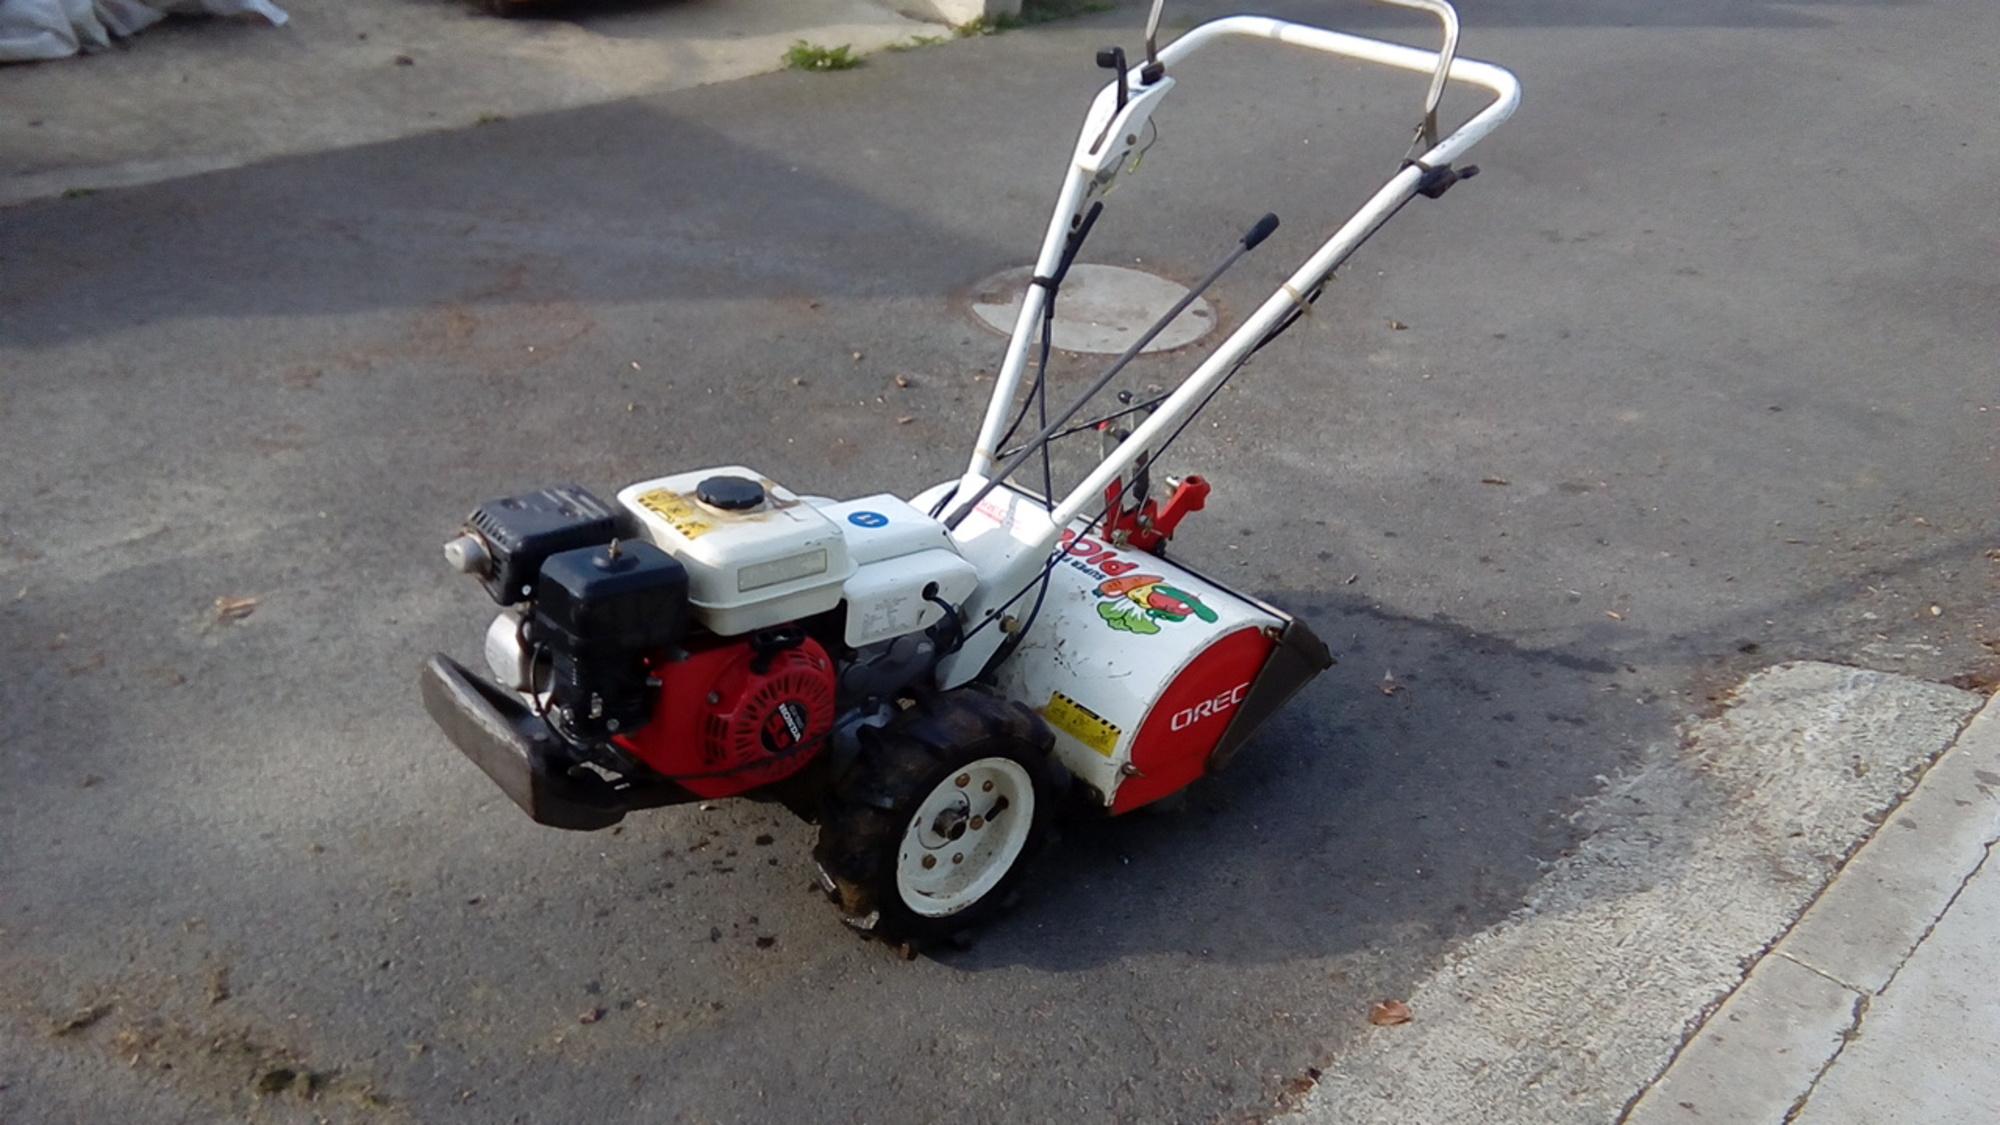 motoculteur  motofraise orec pico